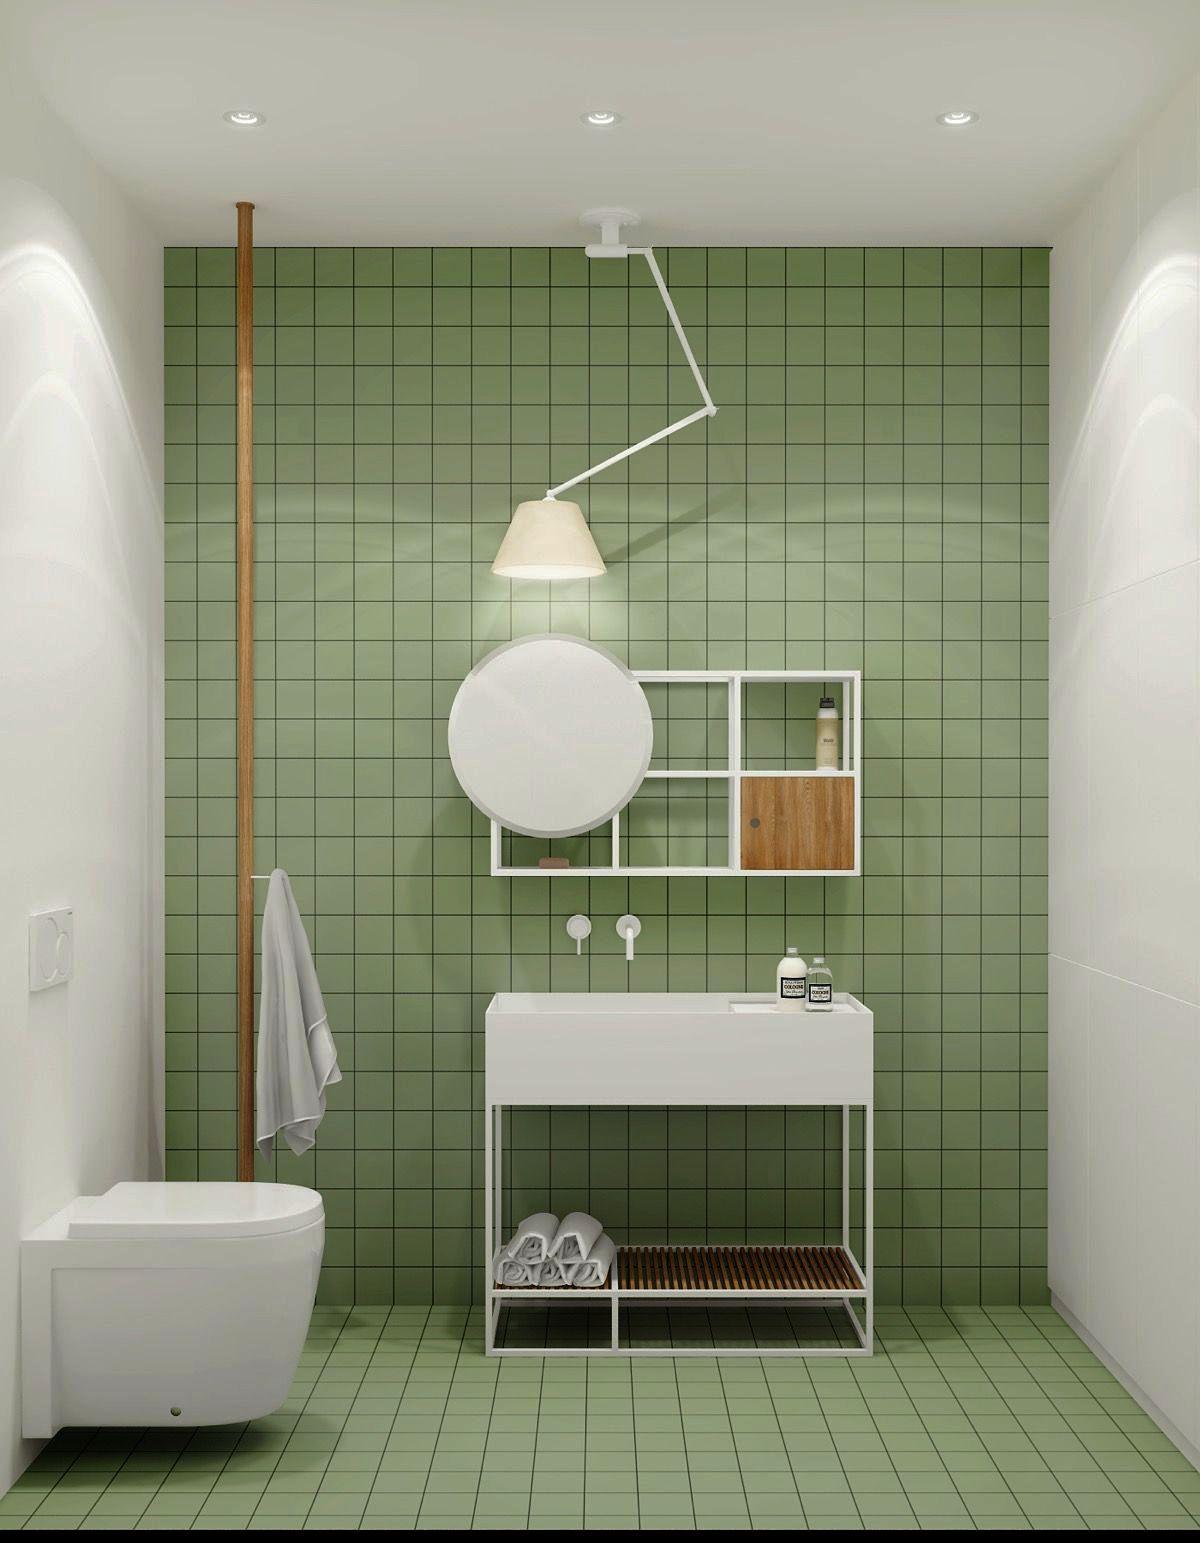 Pin By I Ling Shen On Nice Bathrooms Bathroom Interior Design Minimalist Bathroom Bathroom Interior